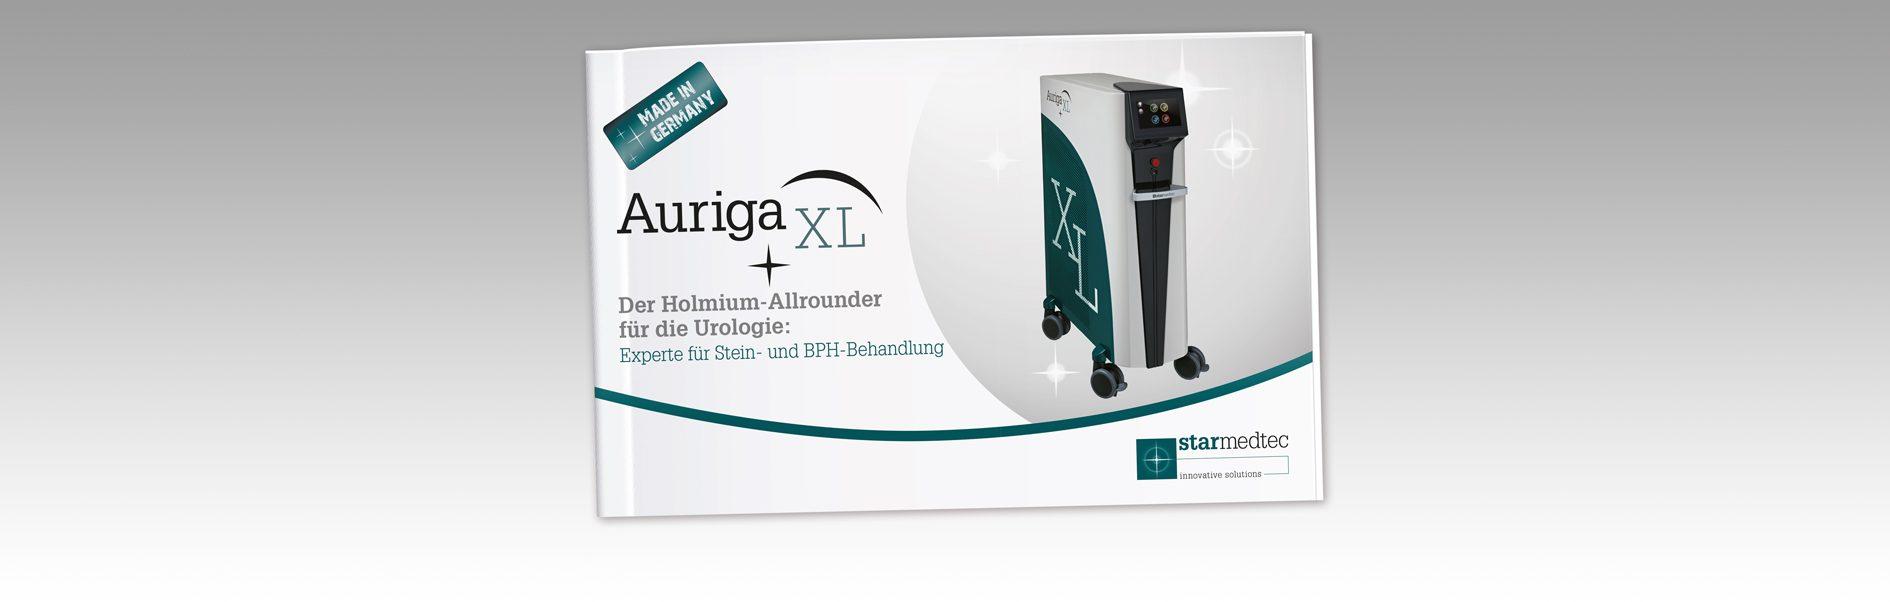 Hier ist das Cover der StarMedTec Produktbroschüre Auriga XL abgebildet.